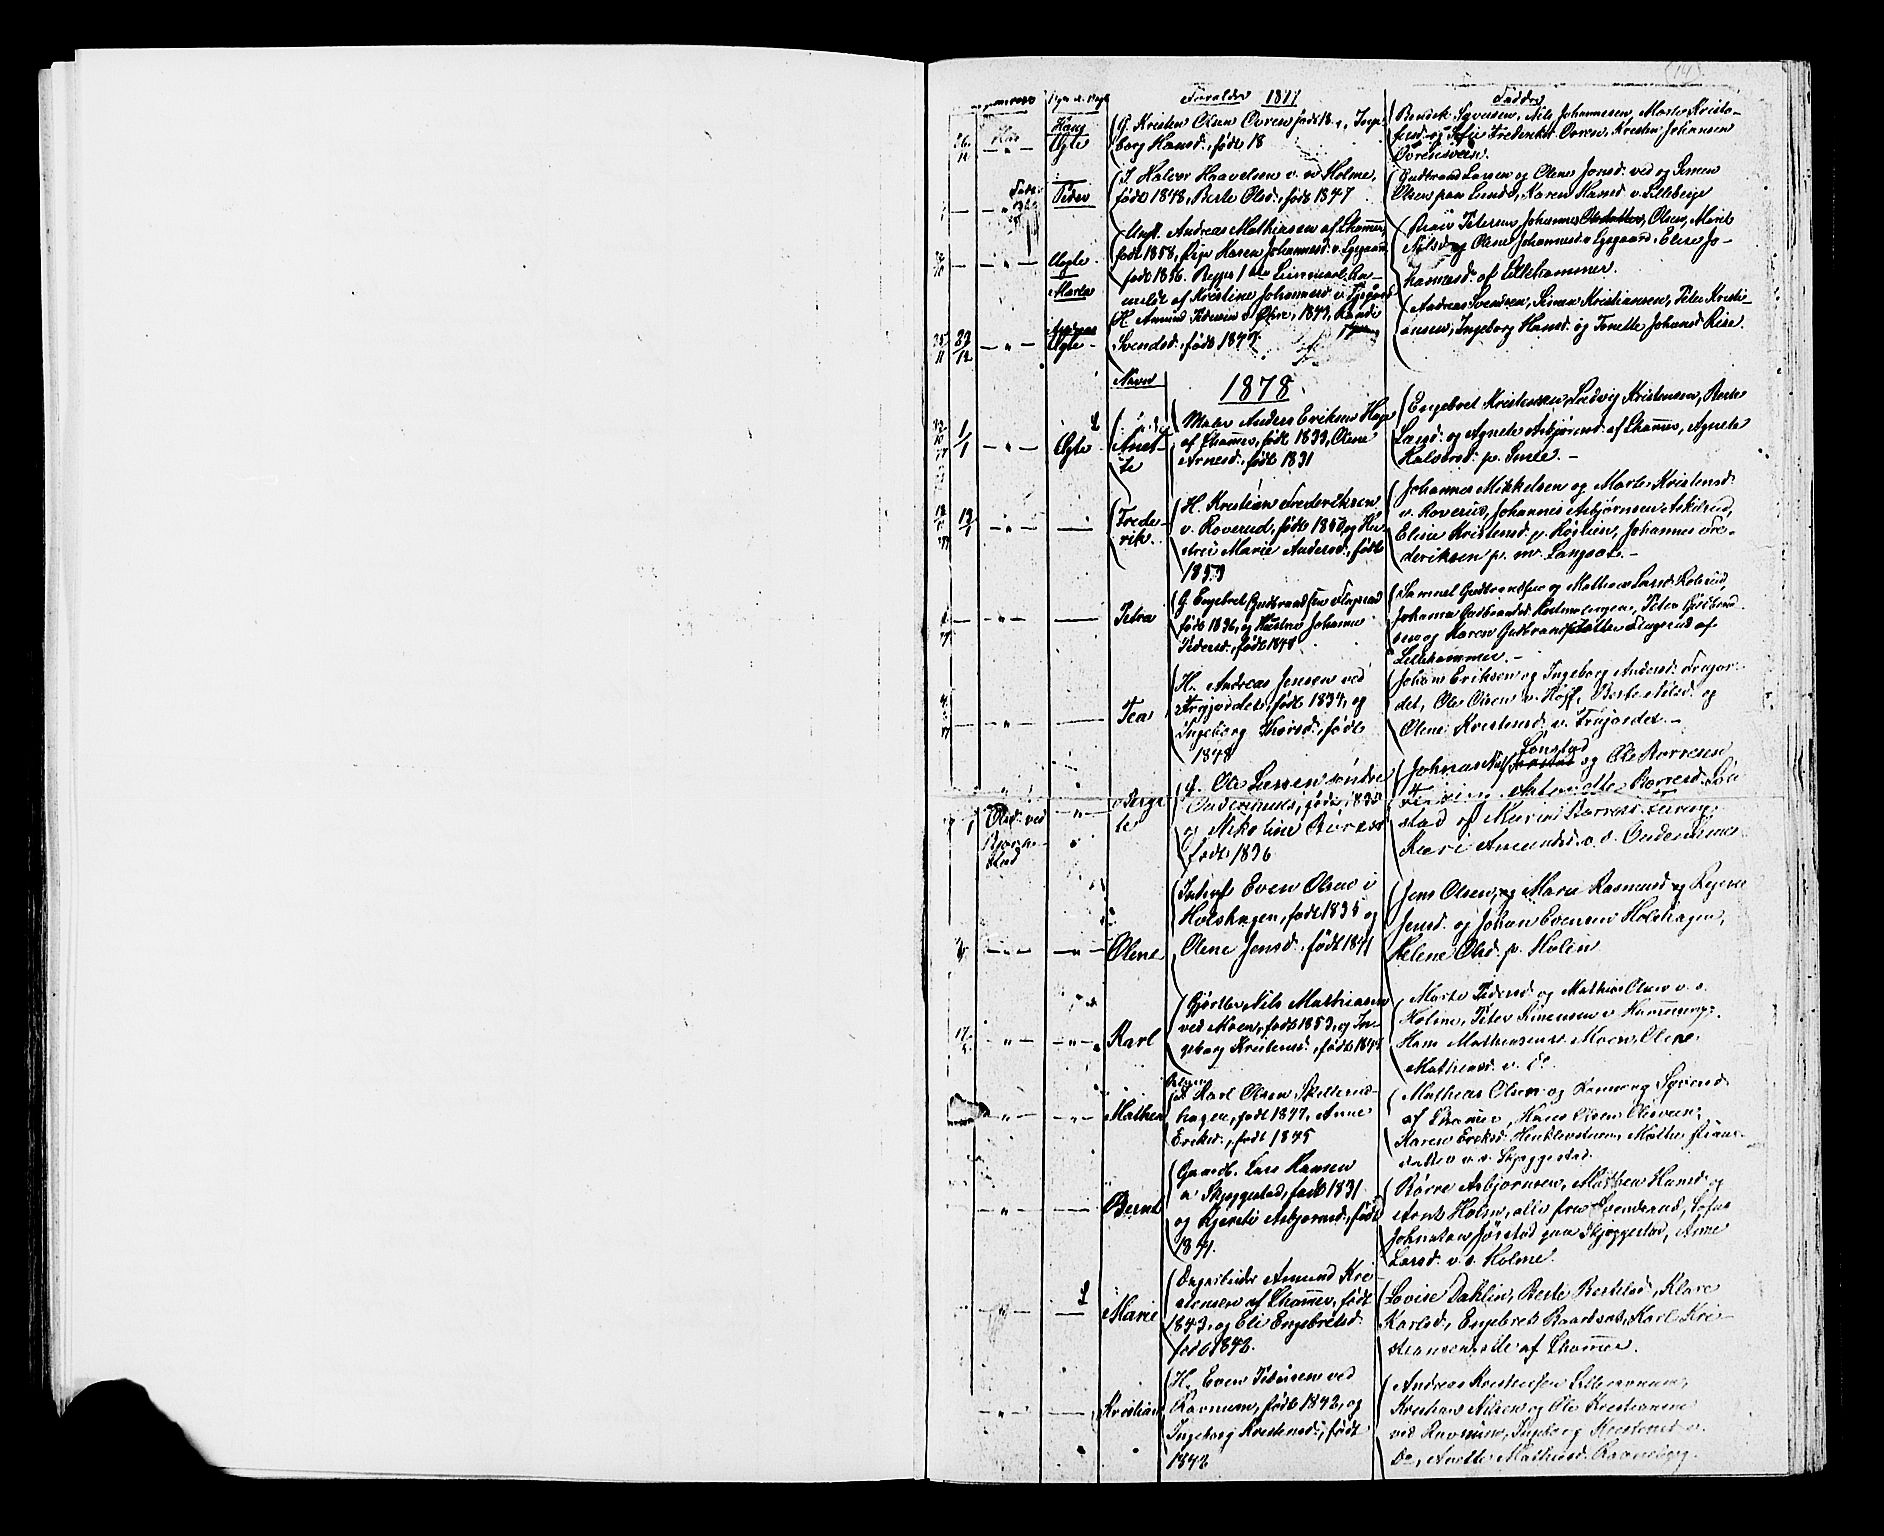 SAH, Fåberg prestekontor, Klokkerbok nr. 7, 1856-1891, s. 14